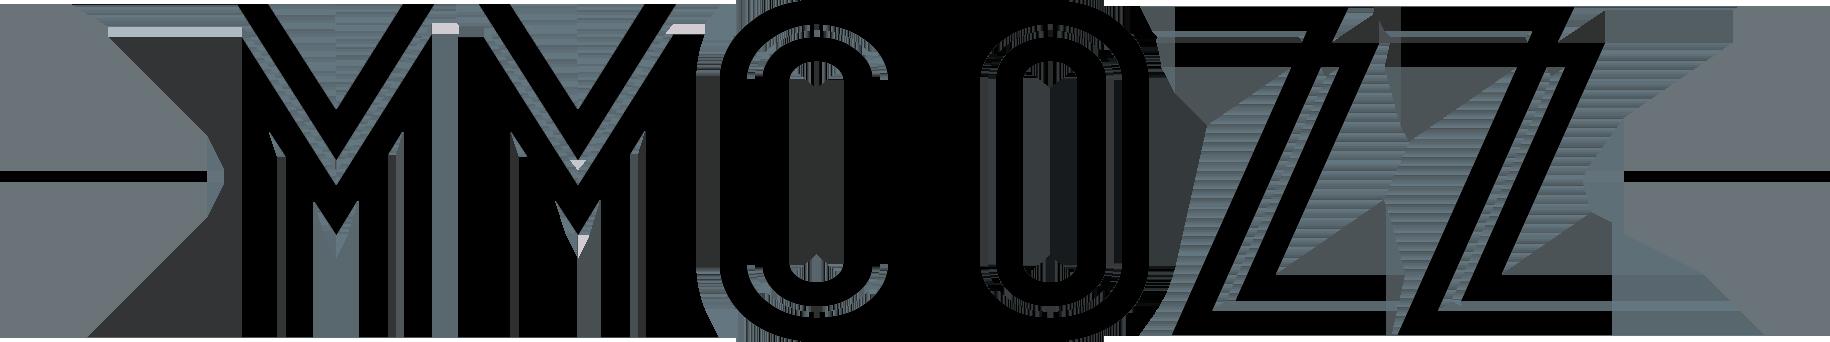 logo-mmoozz-black